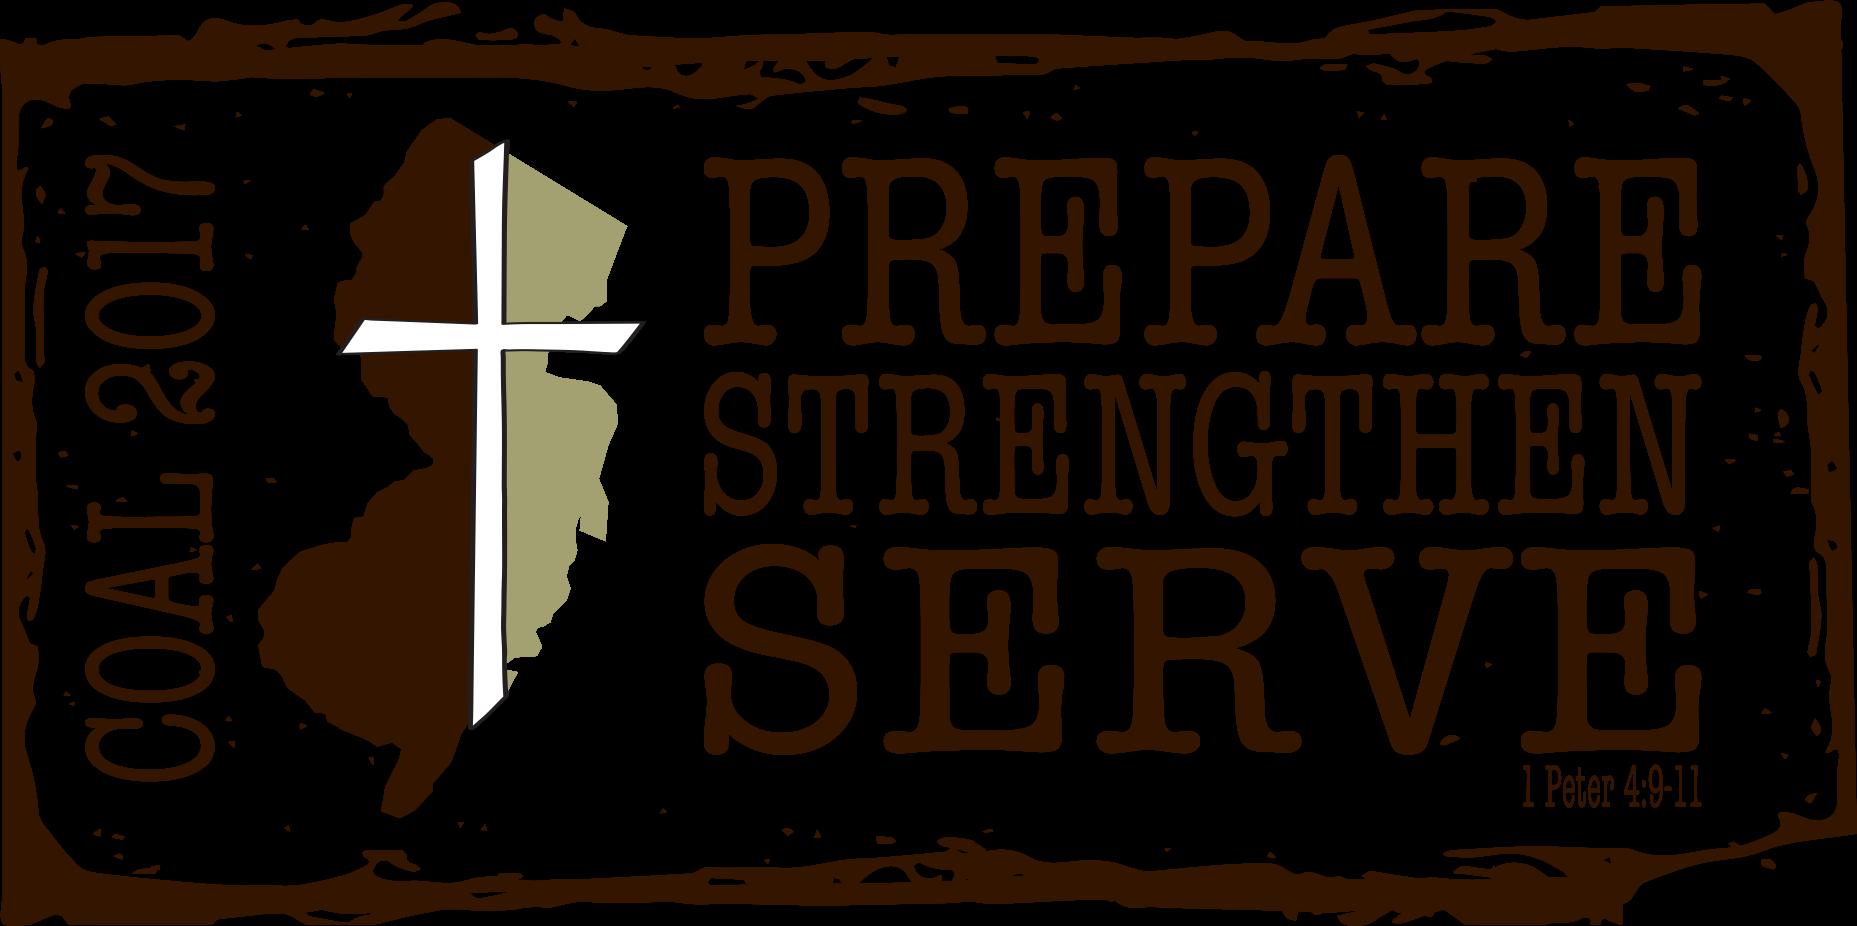 Coal 2017 - Prepare, Strengthen, Serve